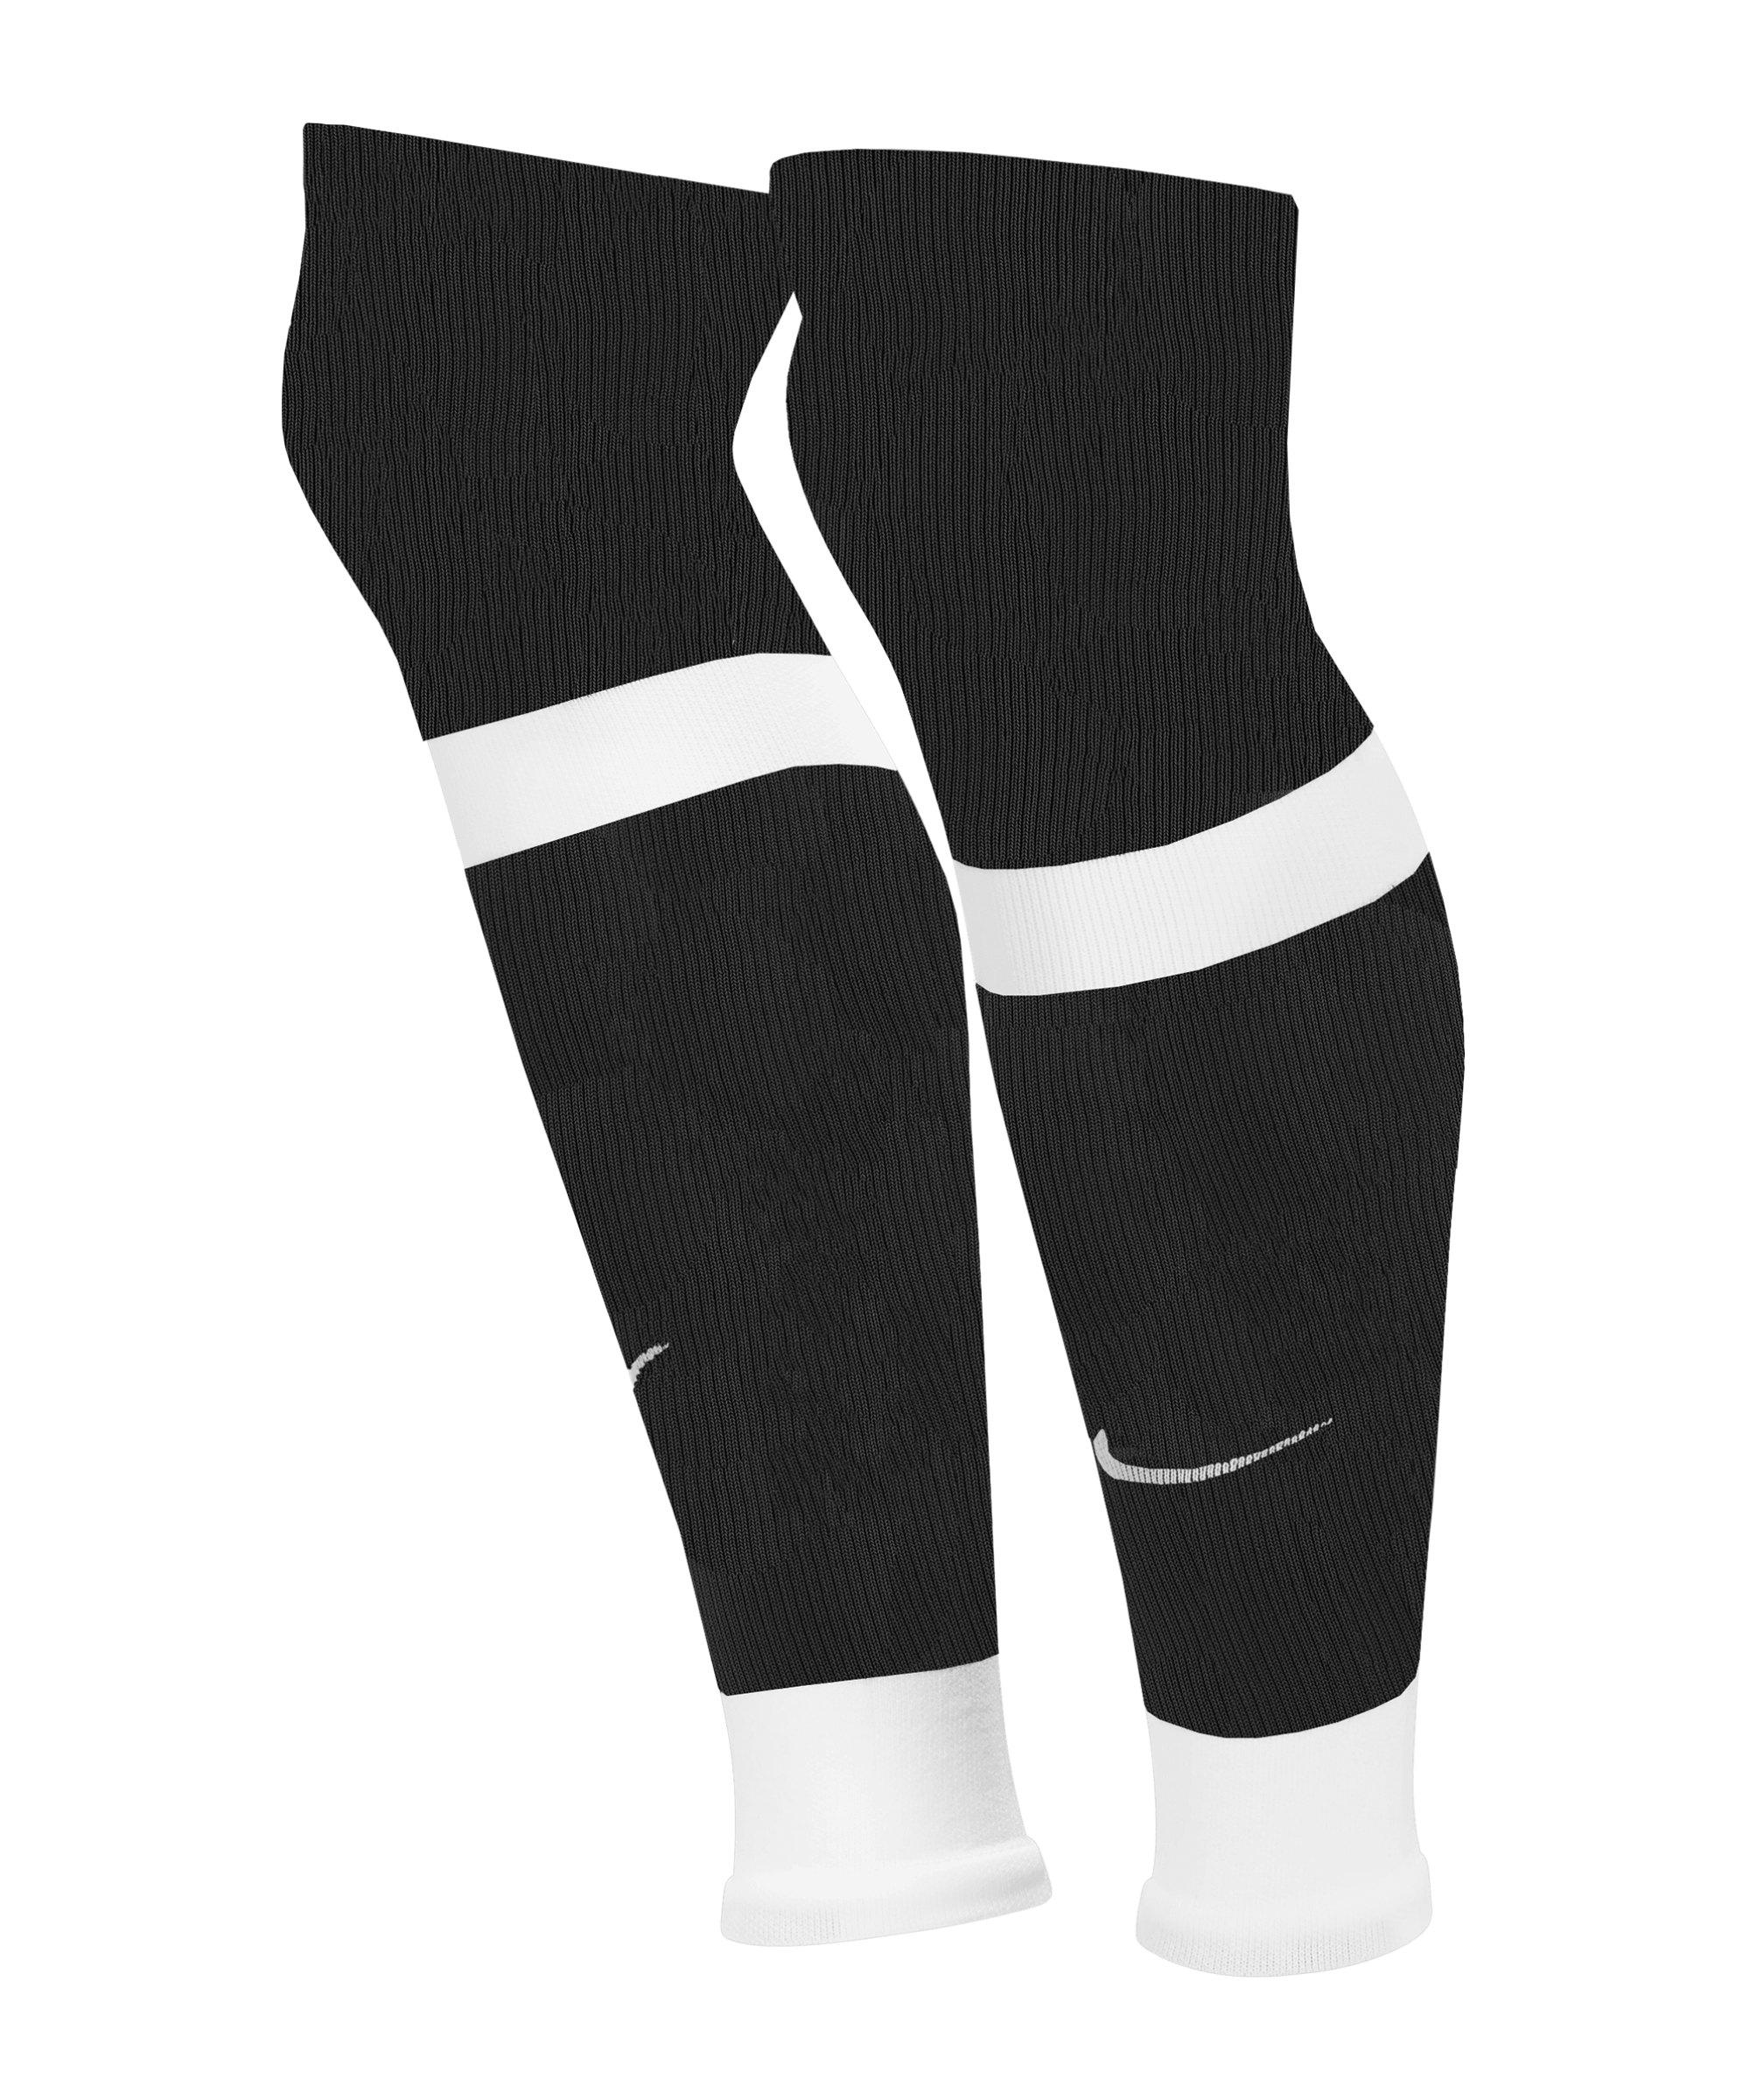 Nike MatchFit Sleeve Schwarz Weiss F010 - schwarz